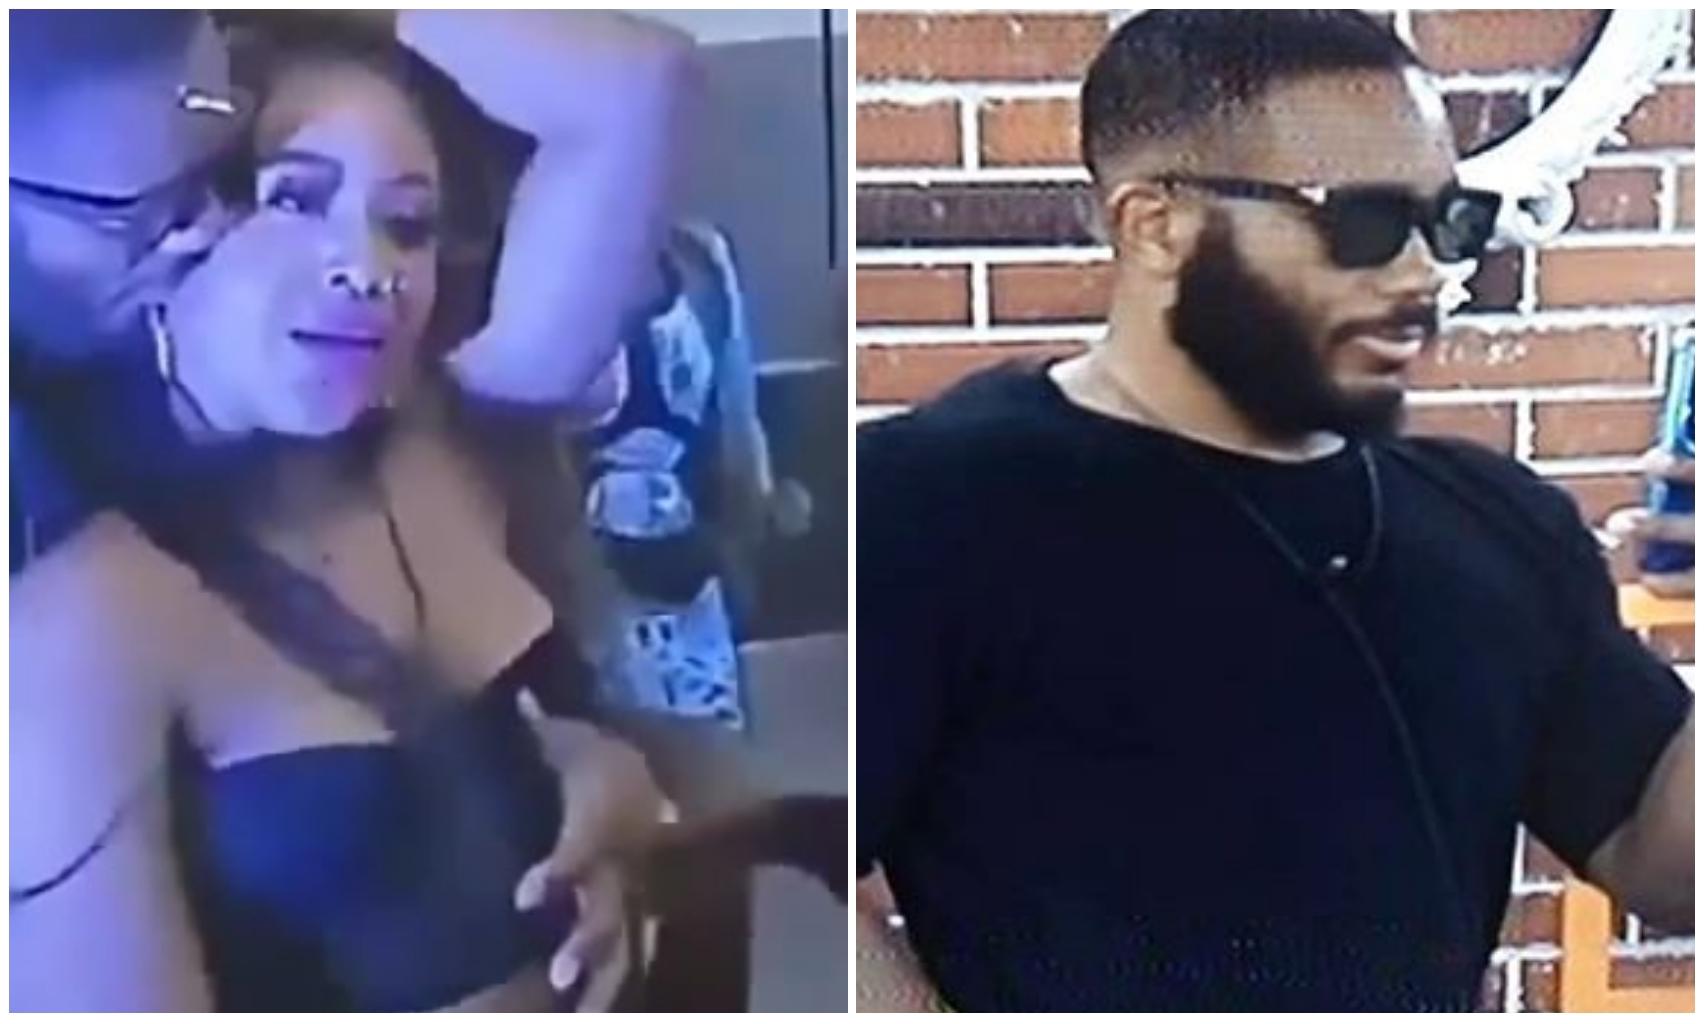 #BBNaija: Moment Kiddwaya fondled Erica's b*obs as she refrain (Video)